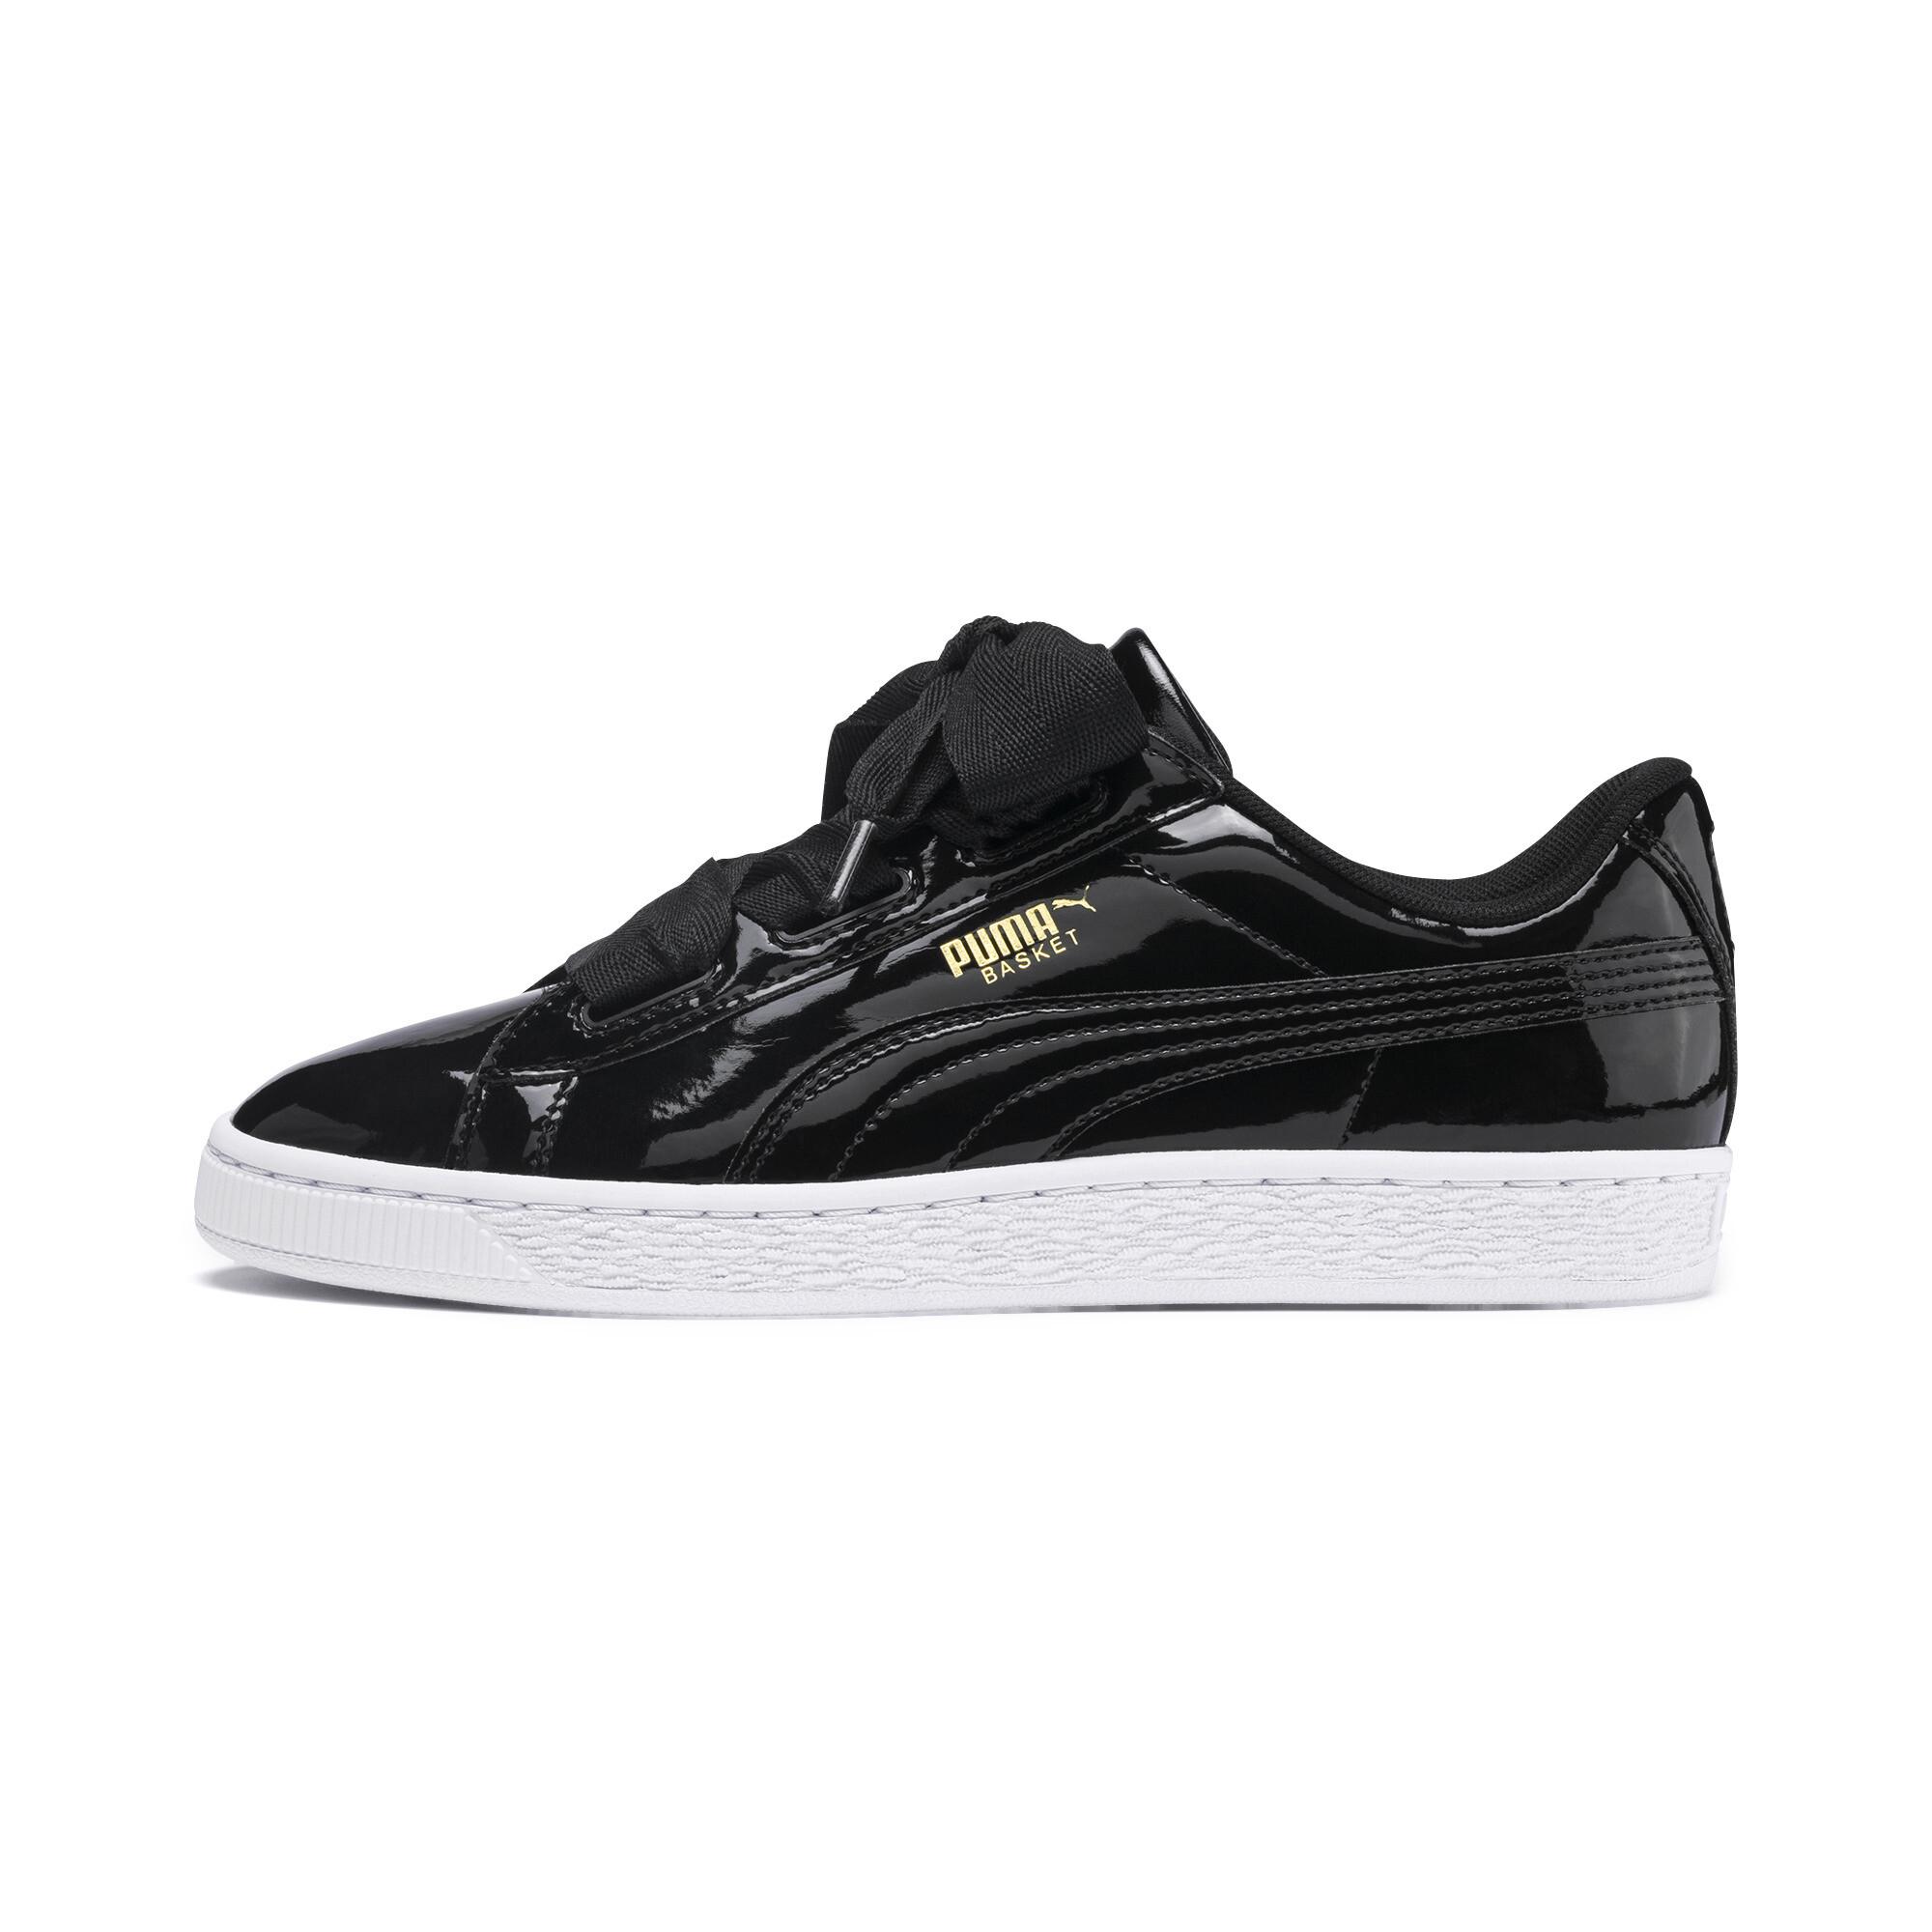 Official Puma Store: PUMA Basket Heart Patent Sneakers JR Girls Shoe Kids |